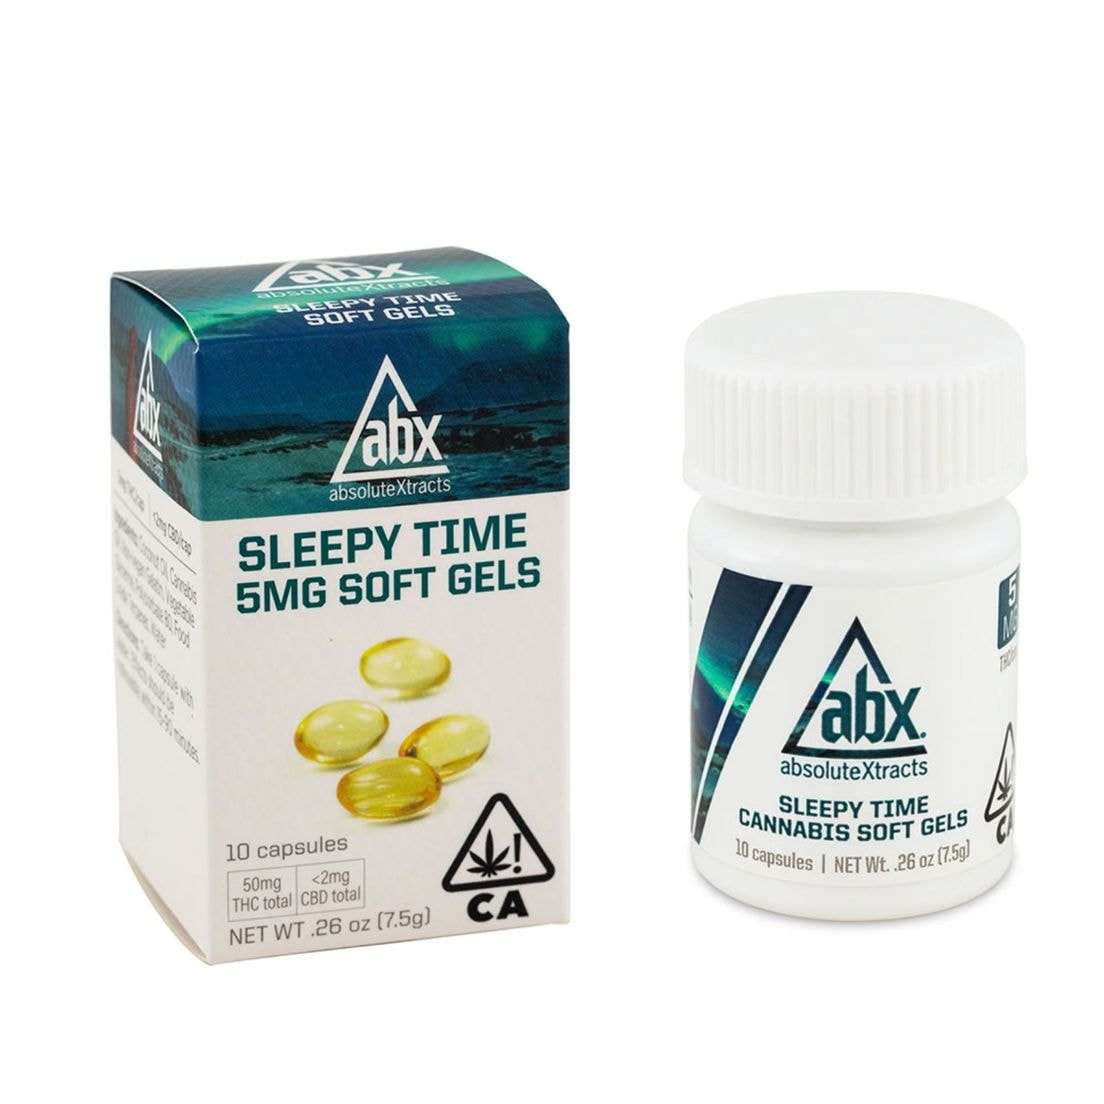 [ABX] THC Soft Gels - 5mg 10ct - Sleepy Time